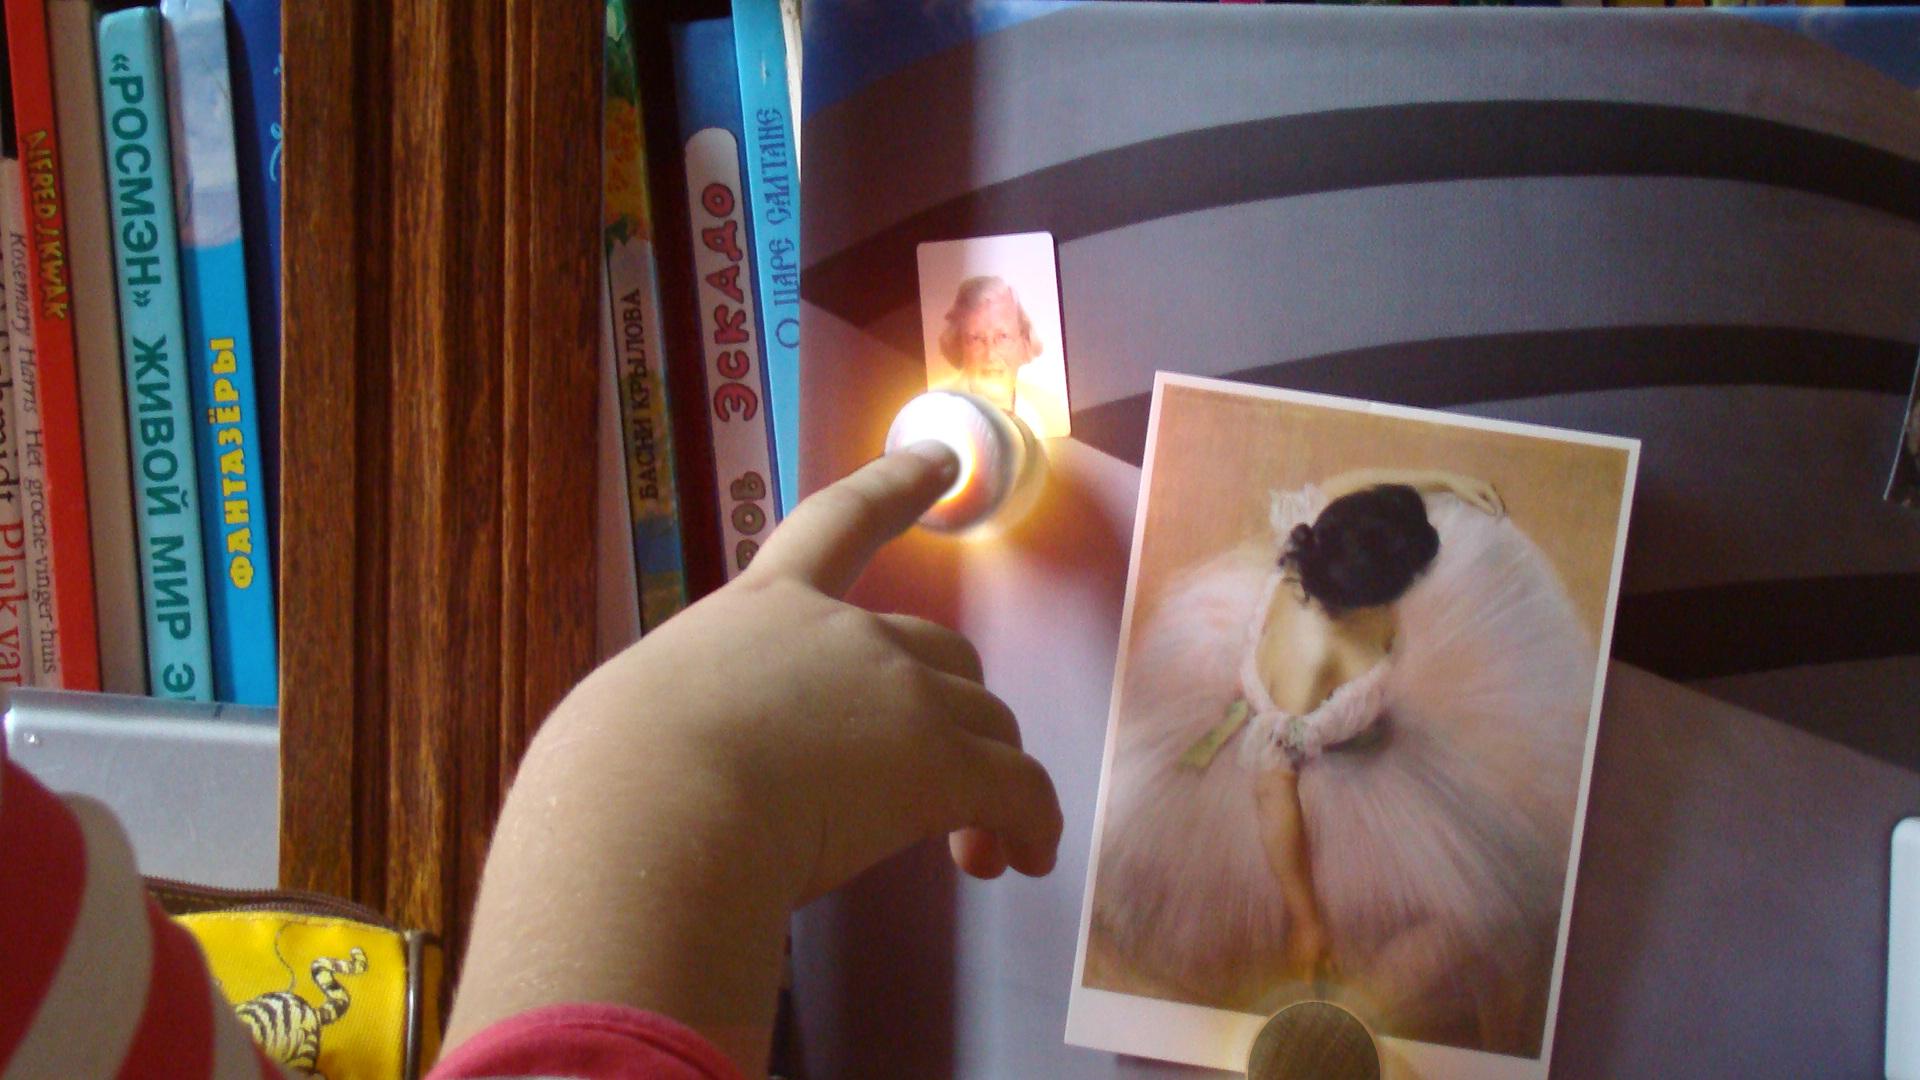 14 Kleinkind raakt Thinkey van oma aan, met licht 2